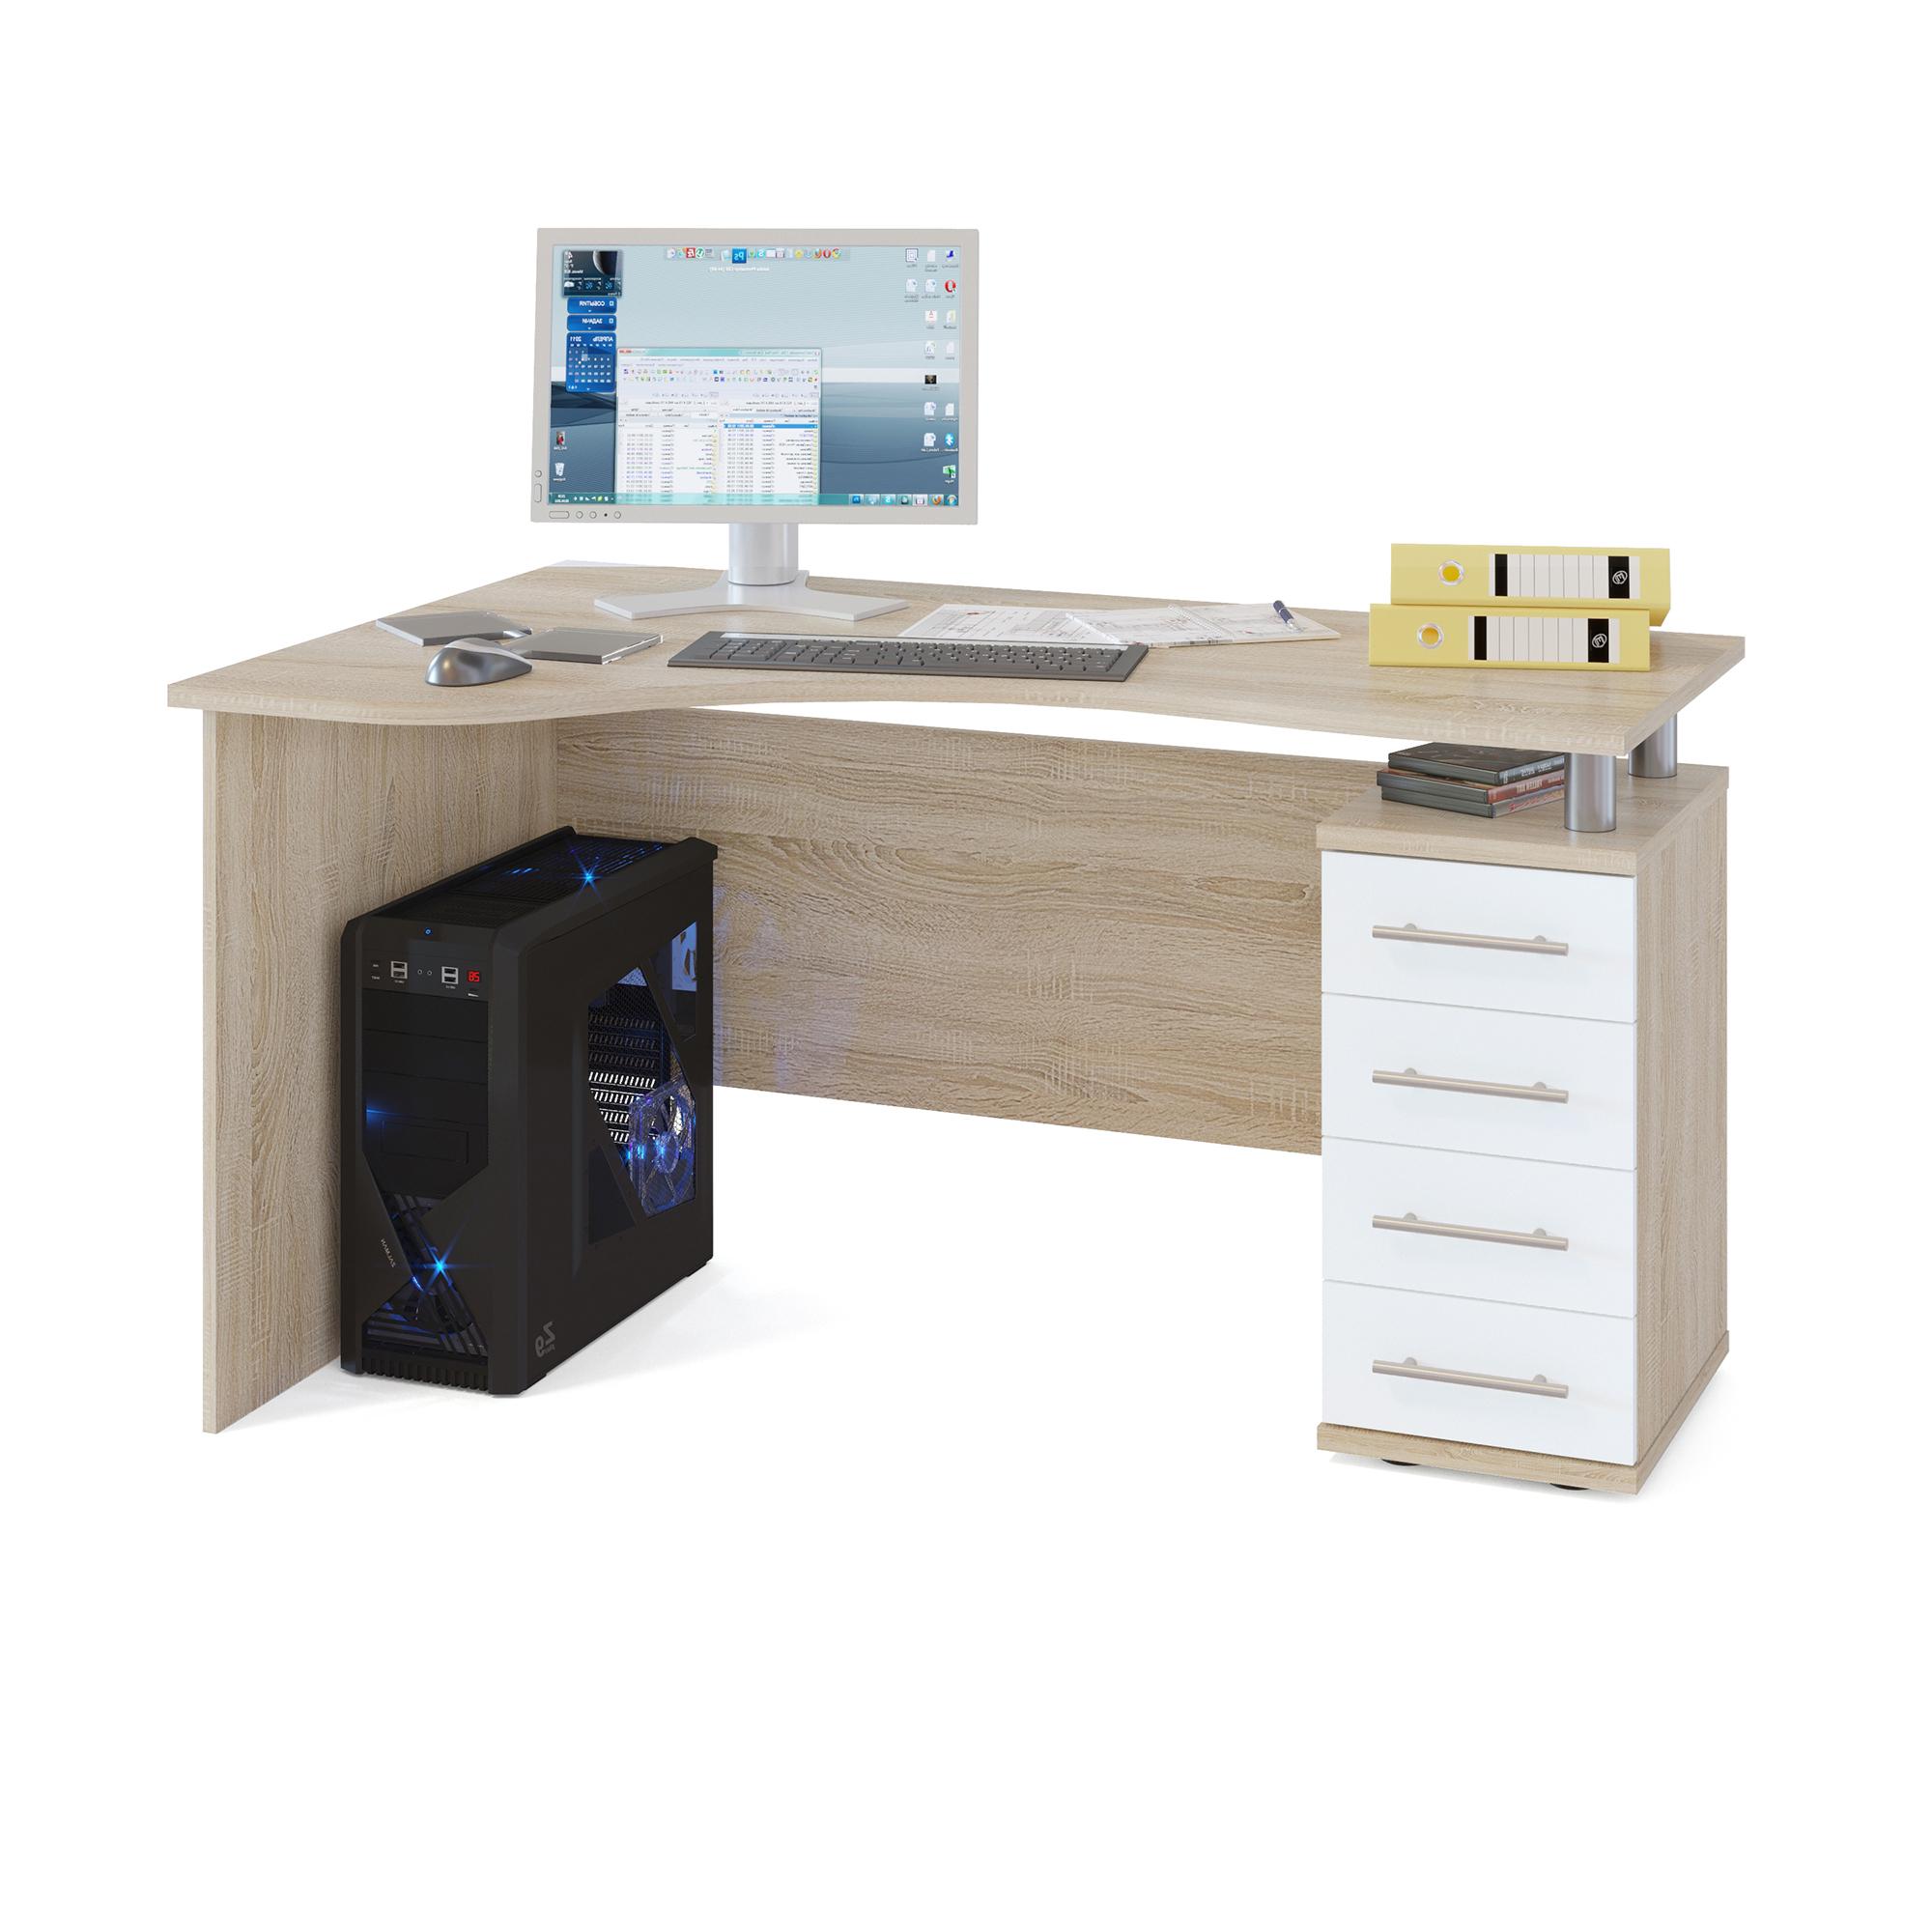 Компьютерный стол СОКОЛ КСТ-104.1П 140x86x75, дуб сонома/белый